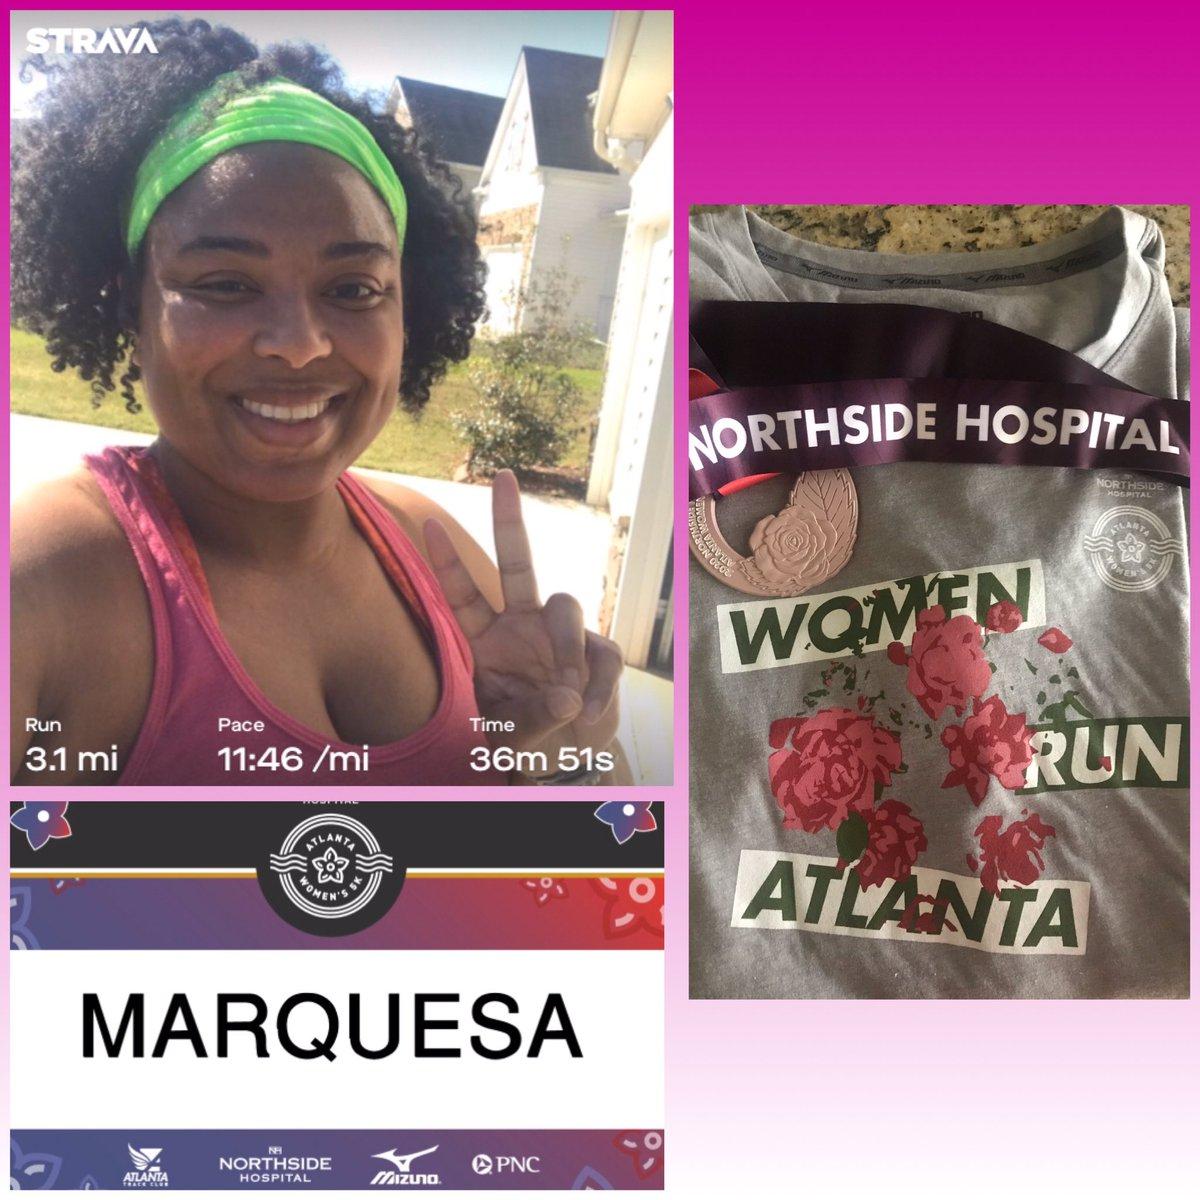 Completed the ATC Northside Hospital Atlanta Women's 5K virtually in my neighborhood!! Great job to all the ladies participating this weekend!! #AW5K  #ATC  #TeacherRunner <br>http://pic.twitter.com/JnMvkTfkuZ